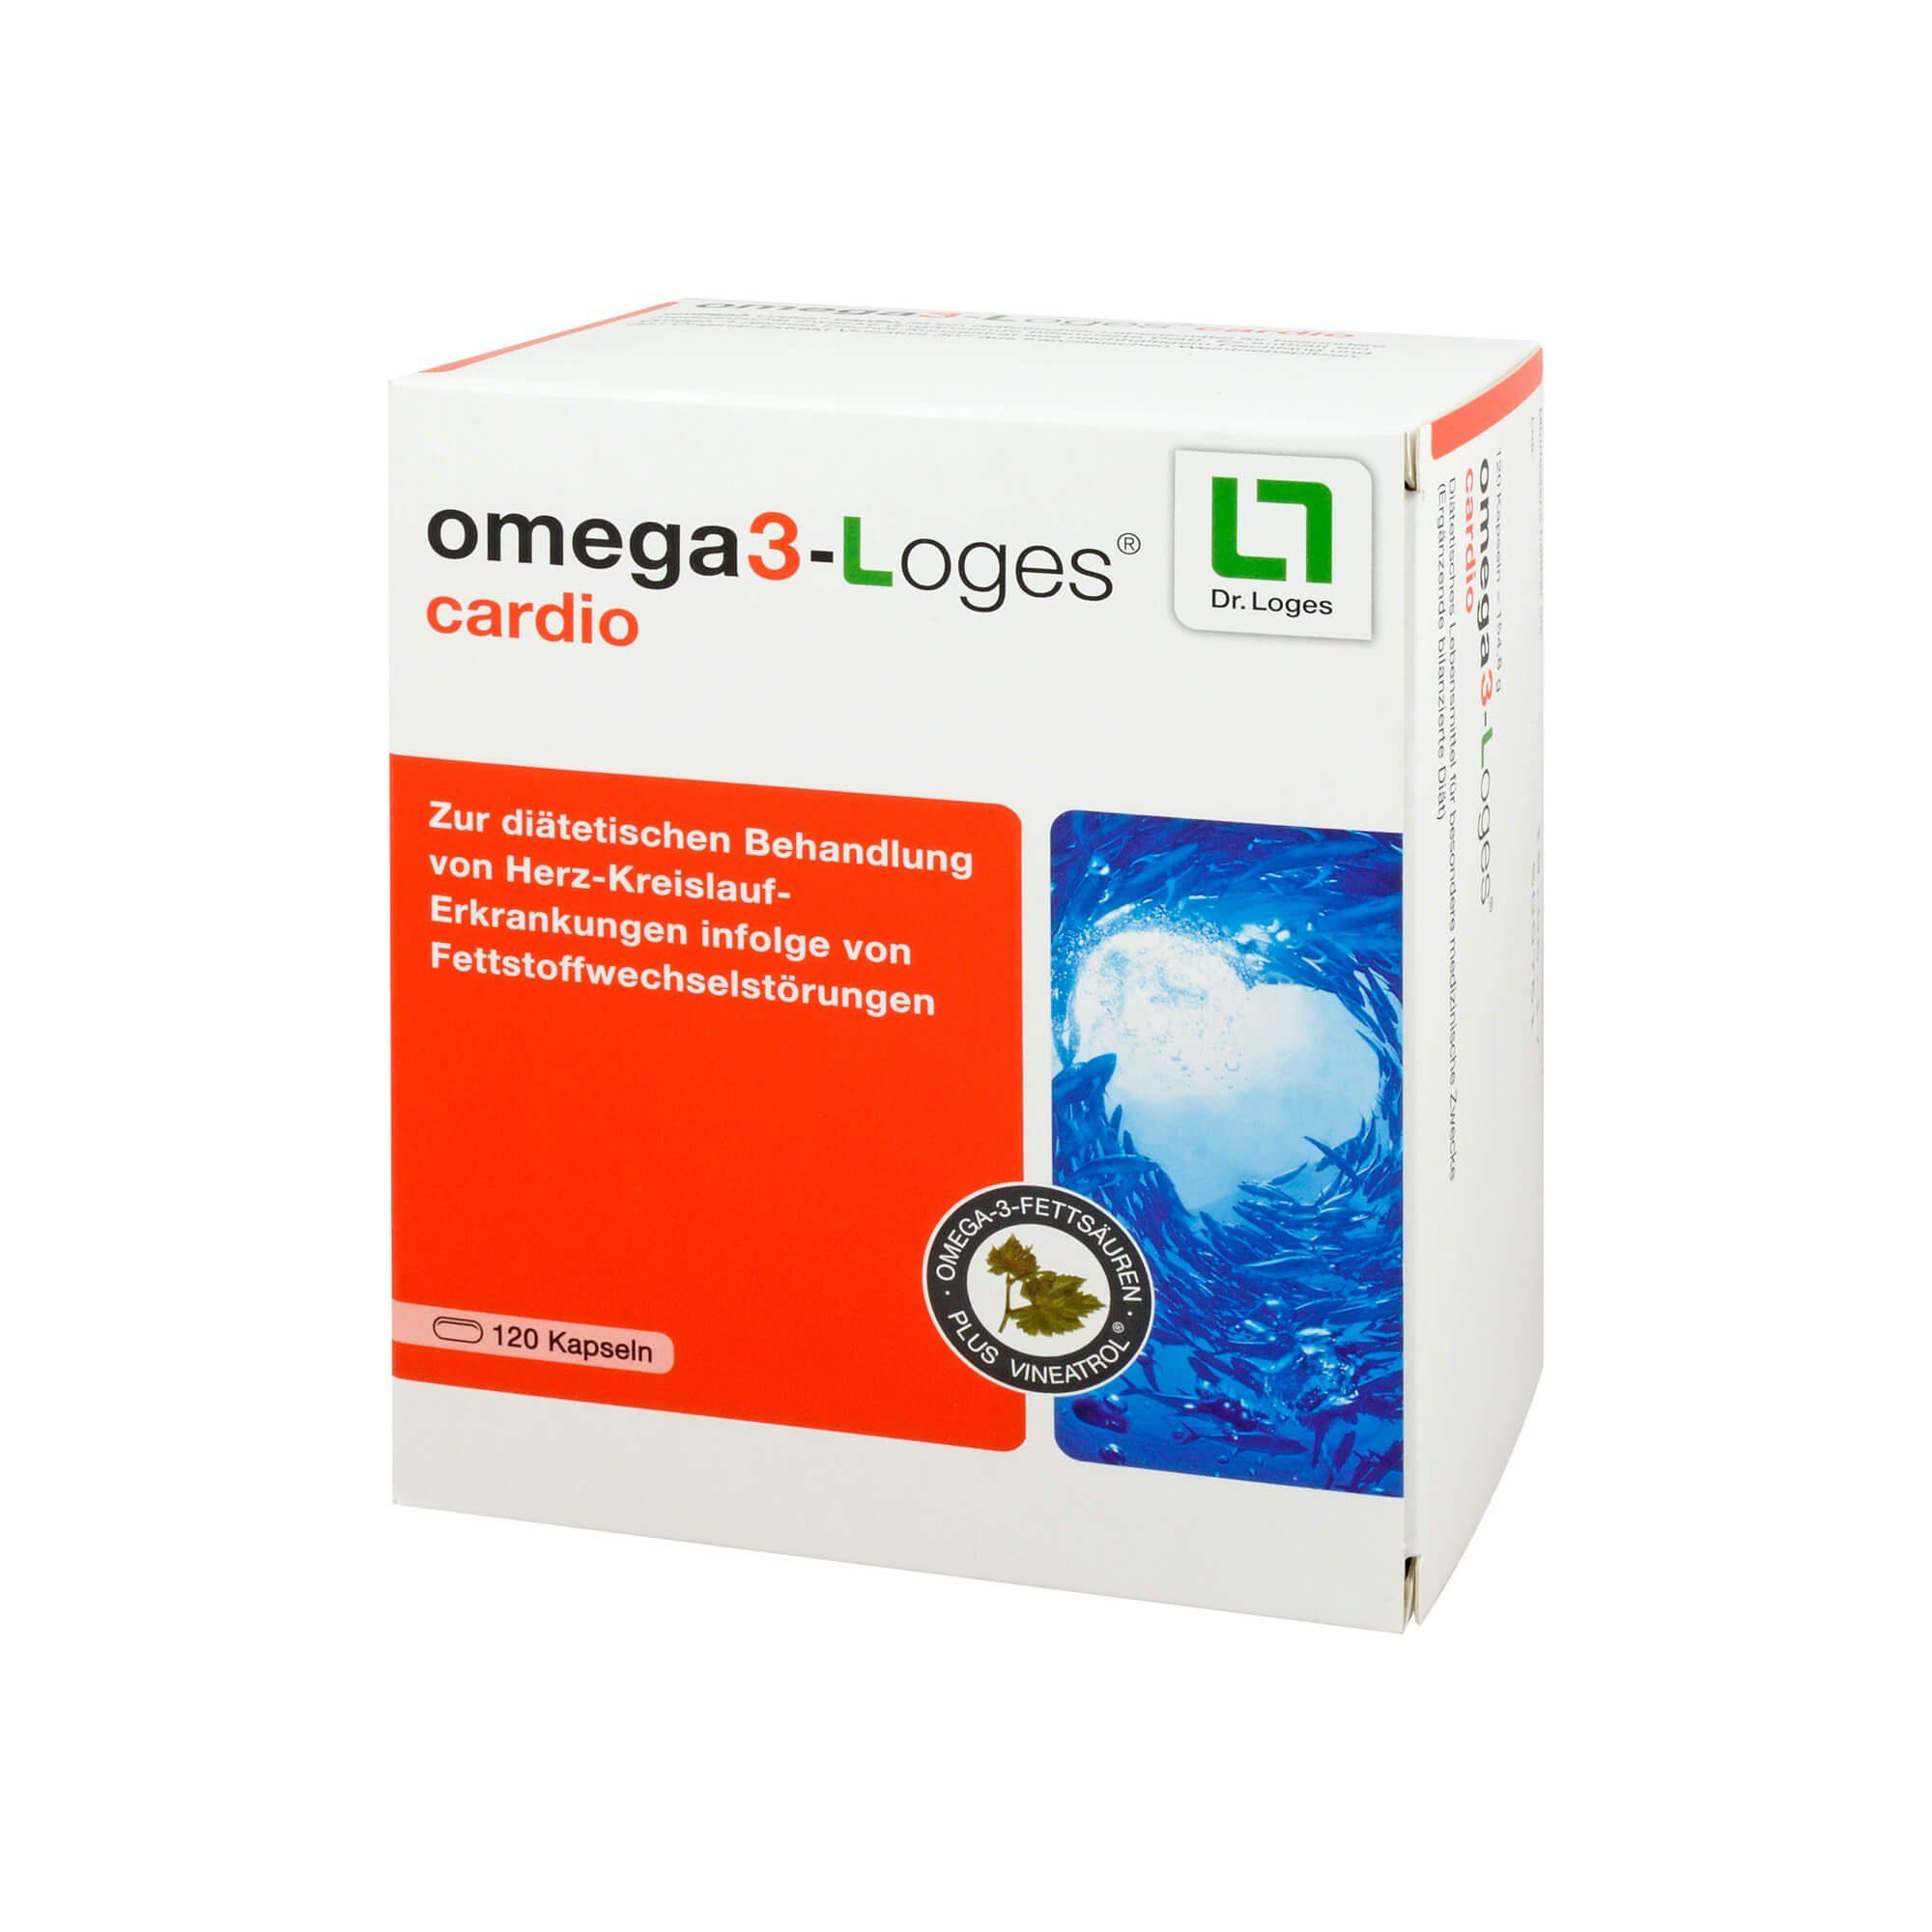 Omega3-loges cardio Kapseln , 120 St